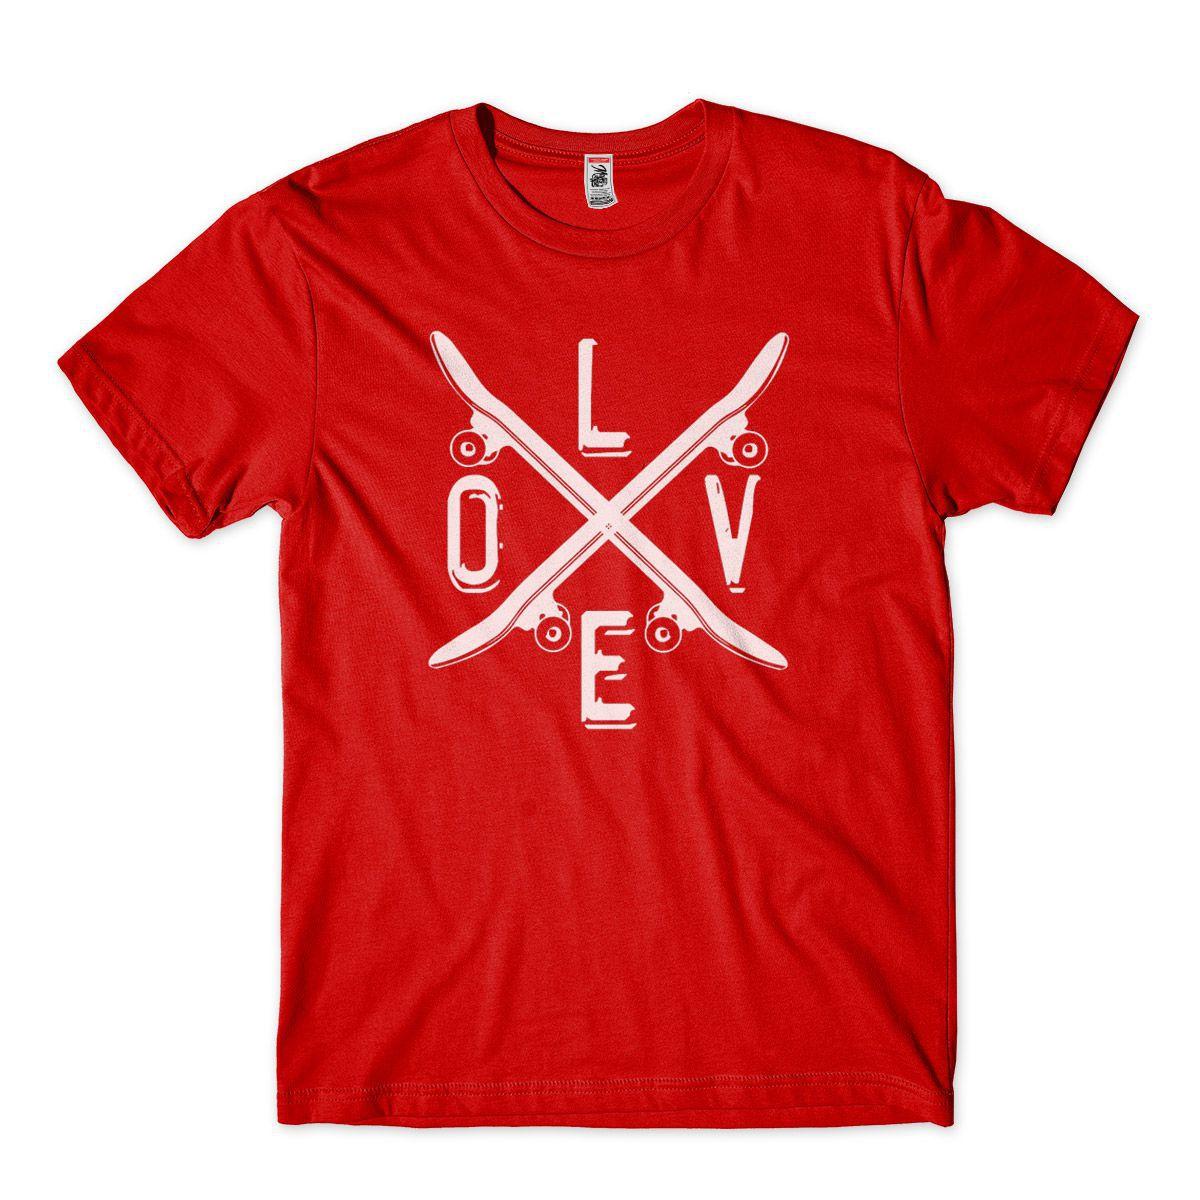 Camiseta Skatista Vermelha Masculina